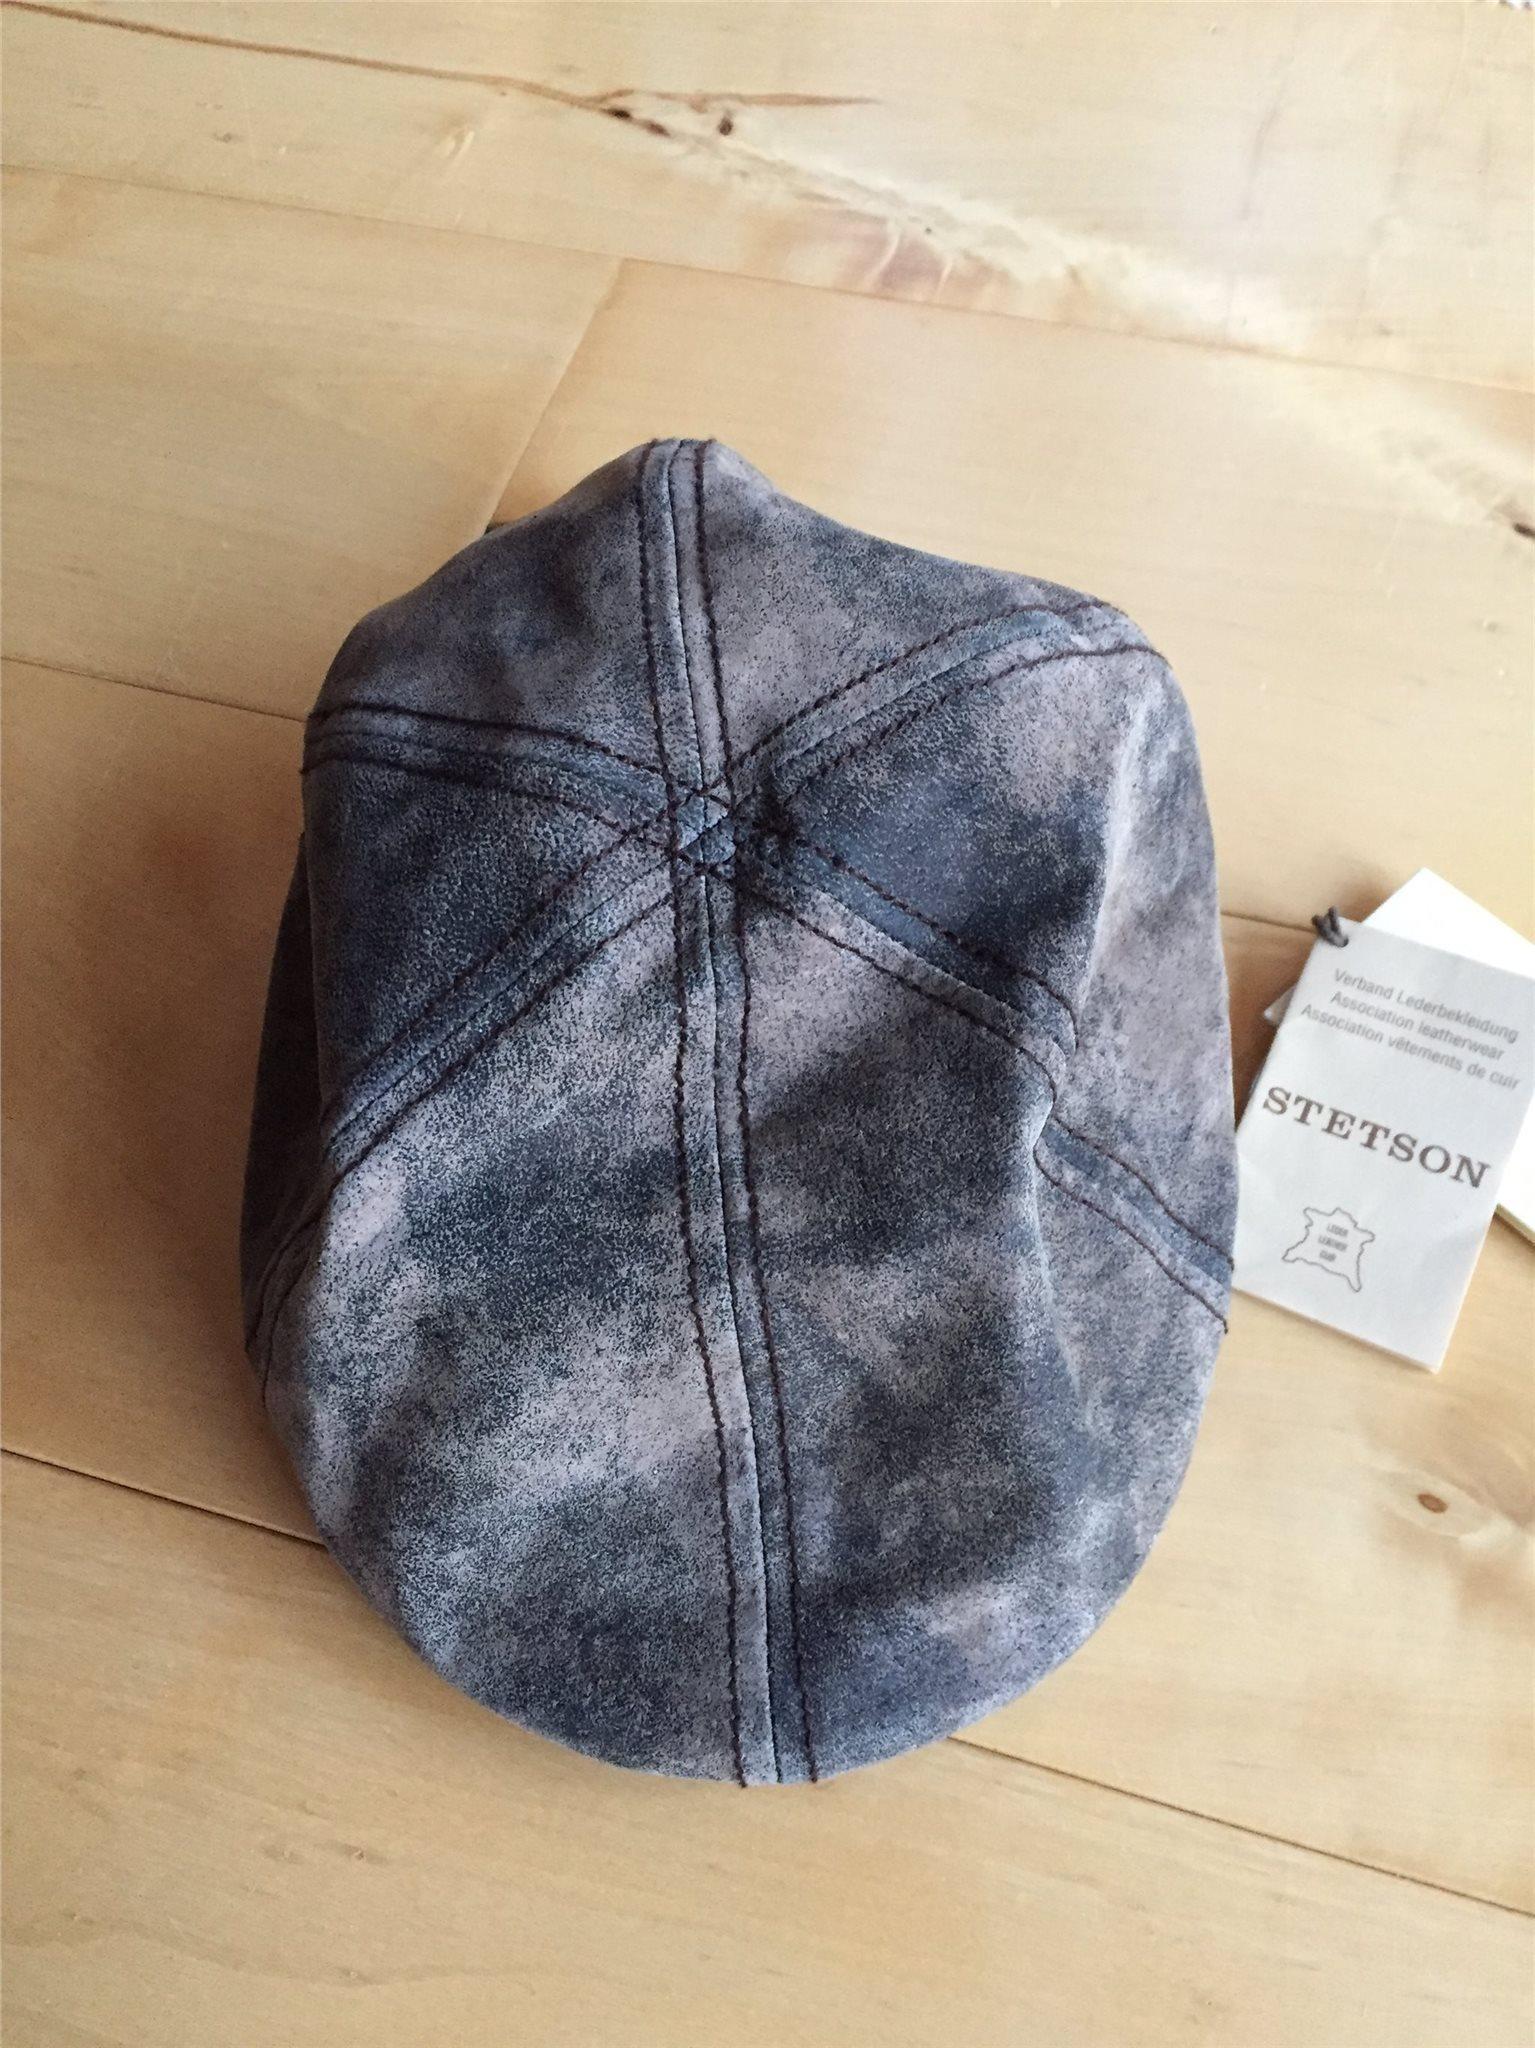 STETSON Texas pig skin sportkeps flat cap skinn (342975077) ᐈ Köp ... ebb6a95d3825b